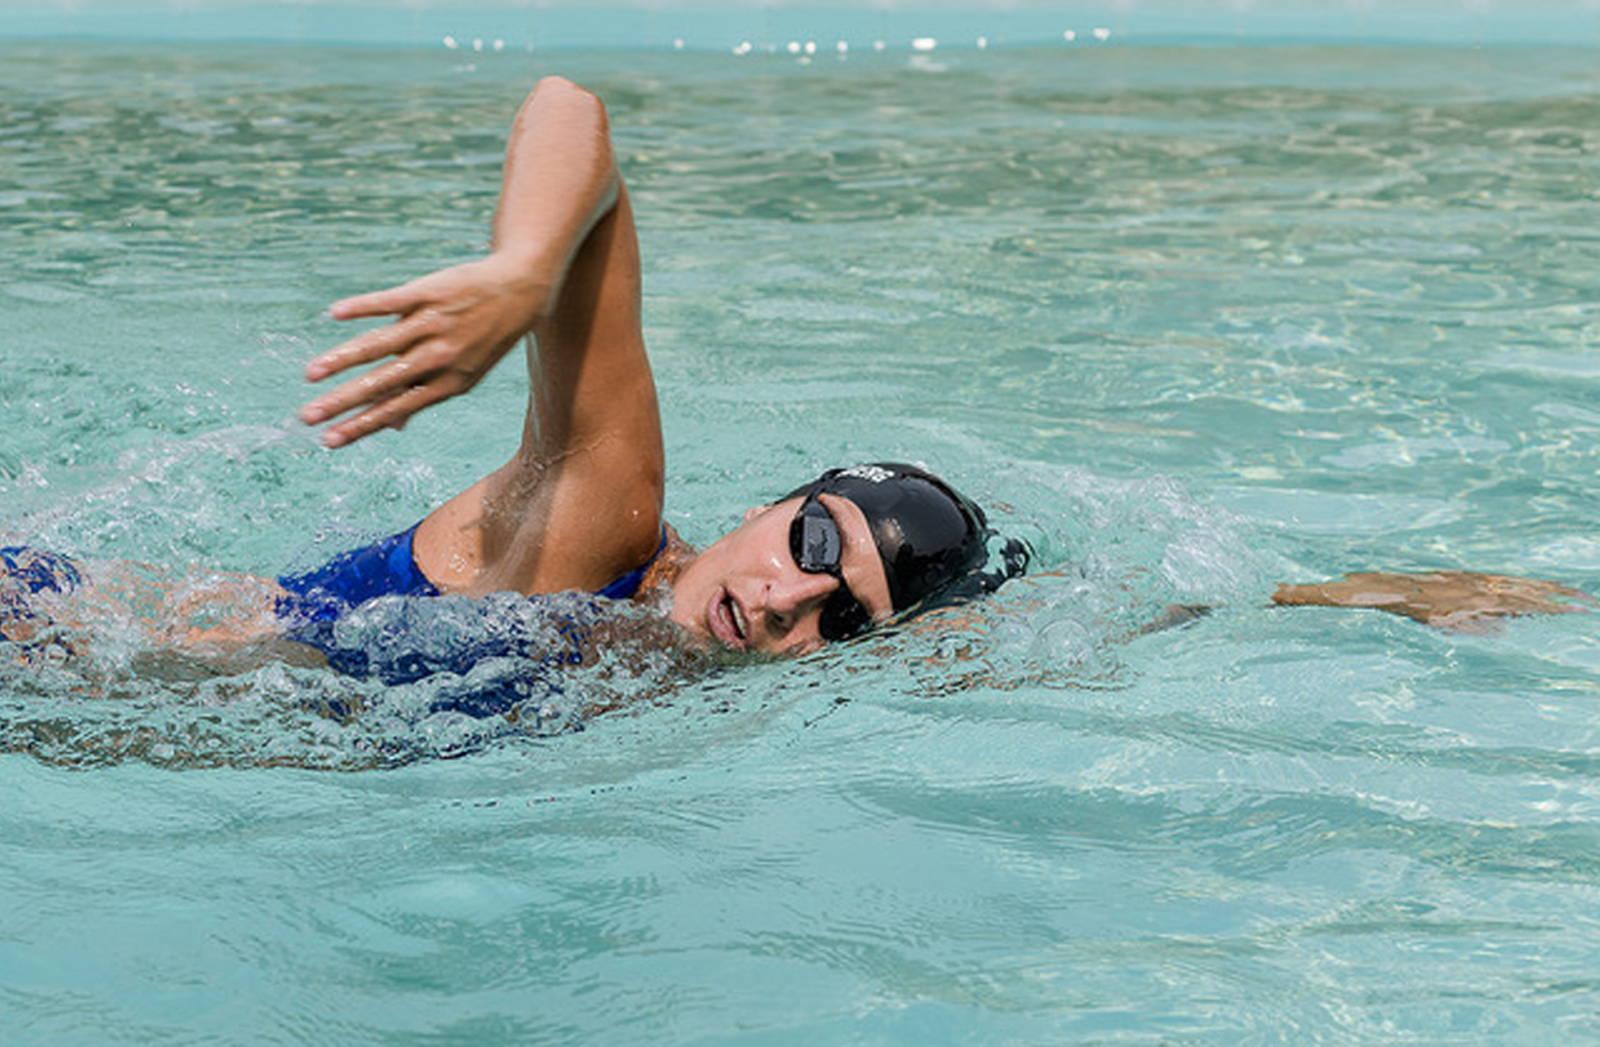 Olympic swimmer Kim Vandenberg swimming in the pool